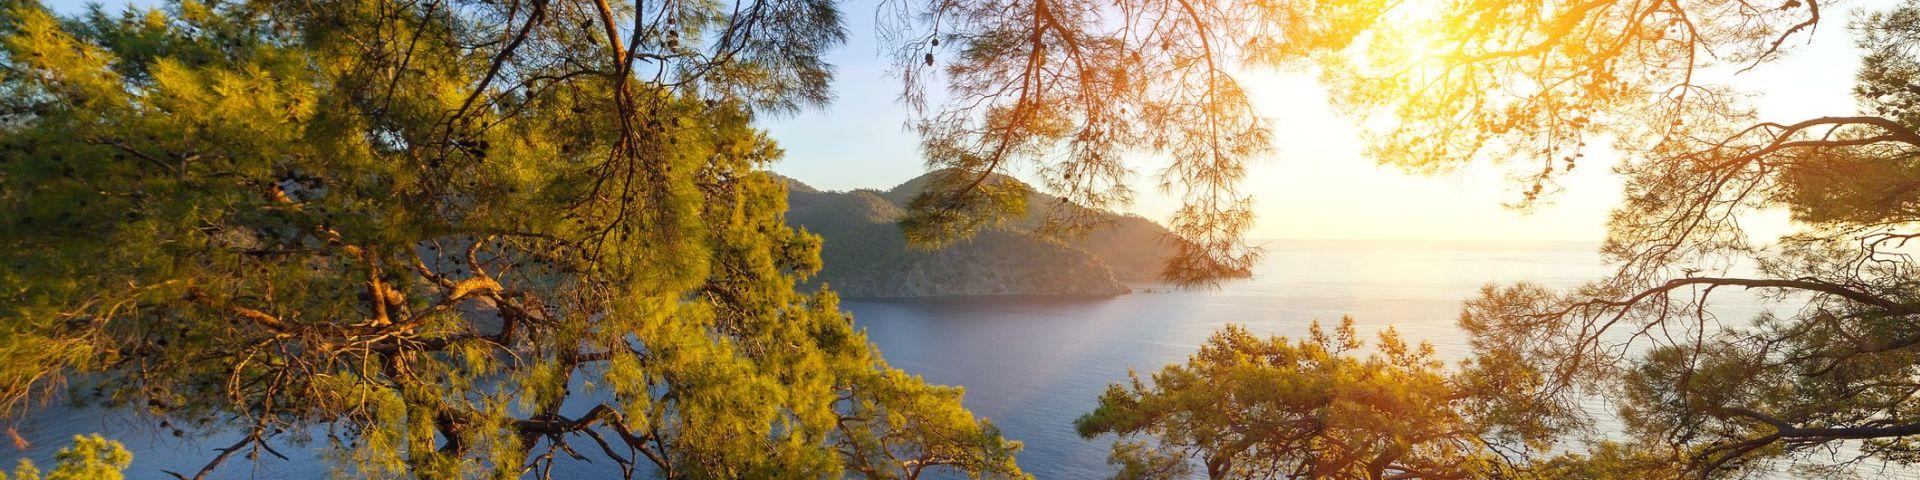 Last Minute to the Turkish Riviera